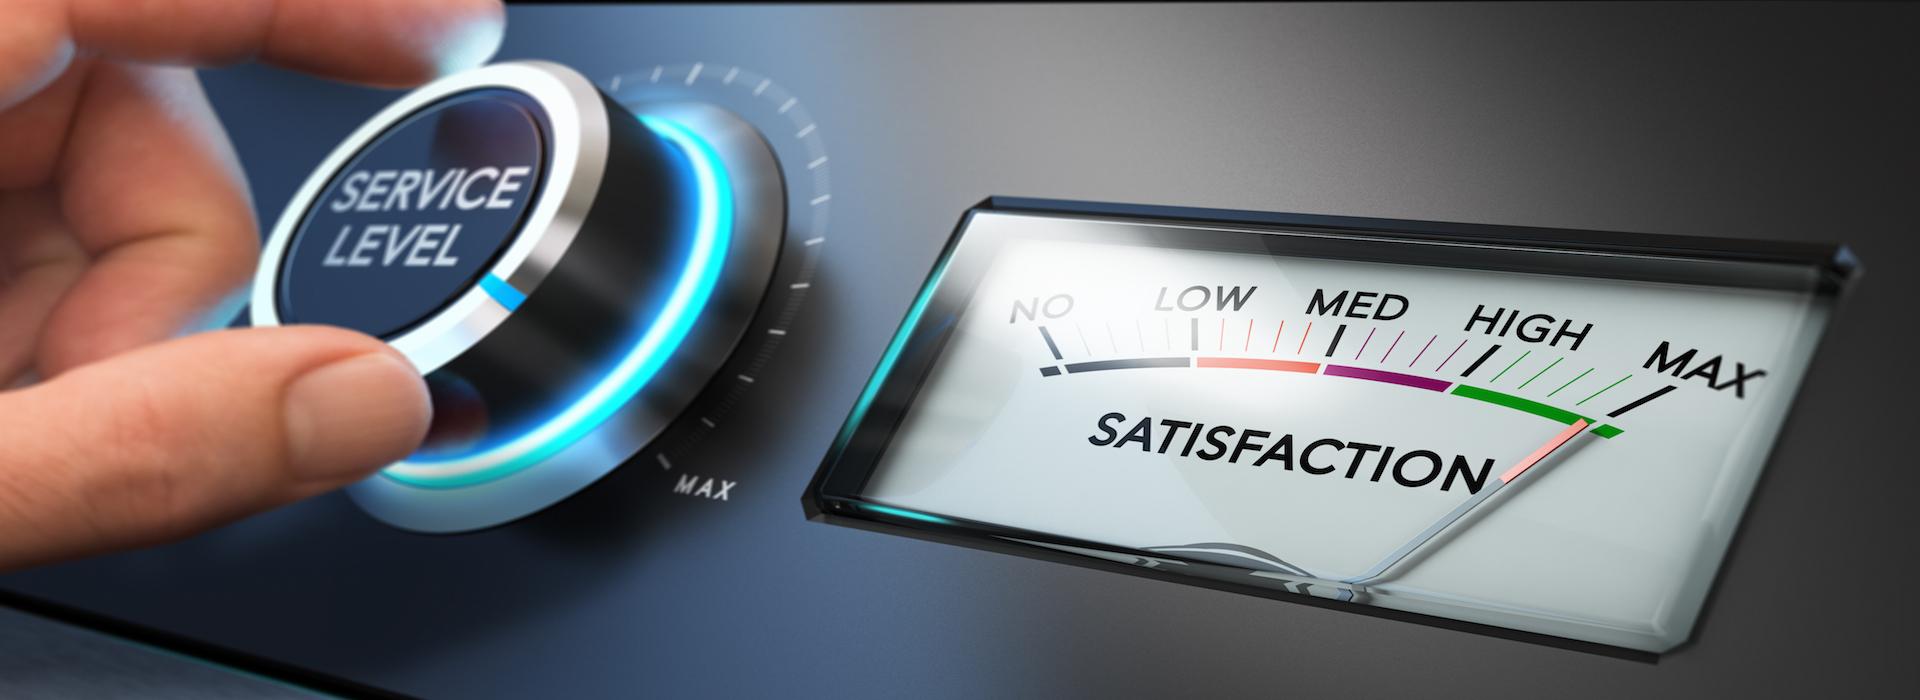 6 Easy Ways to Improve Customer Service